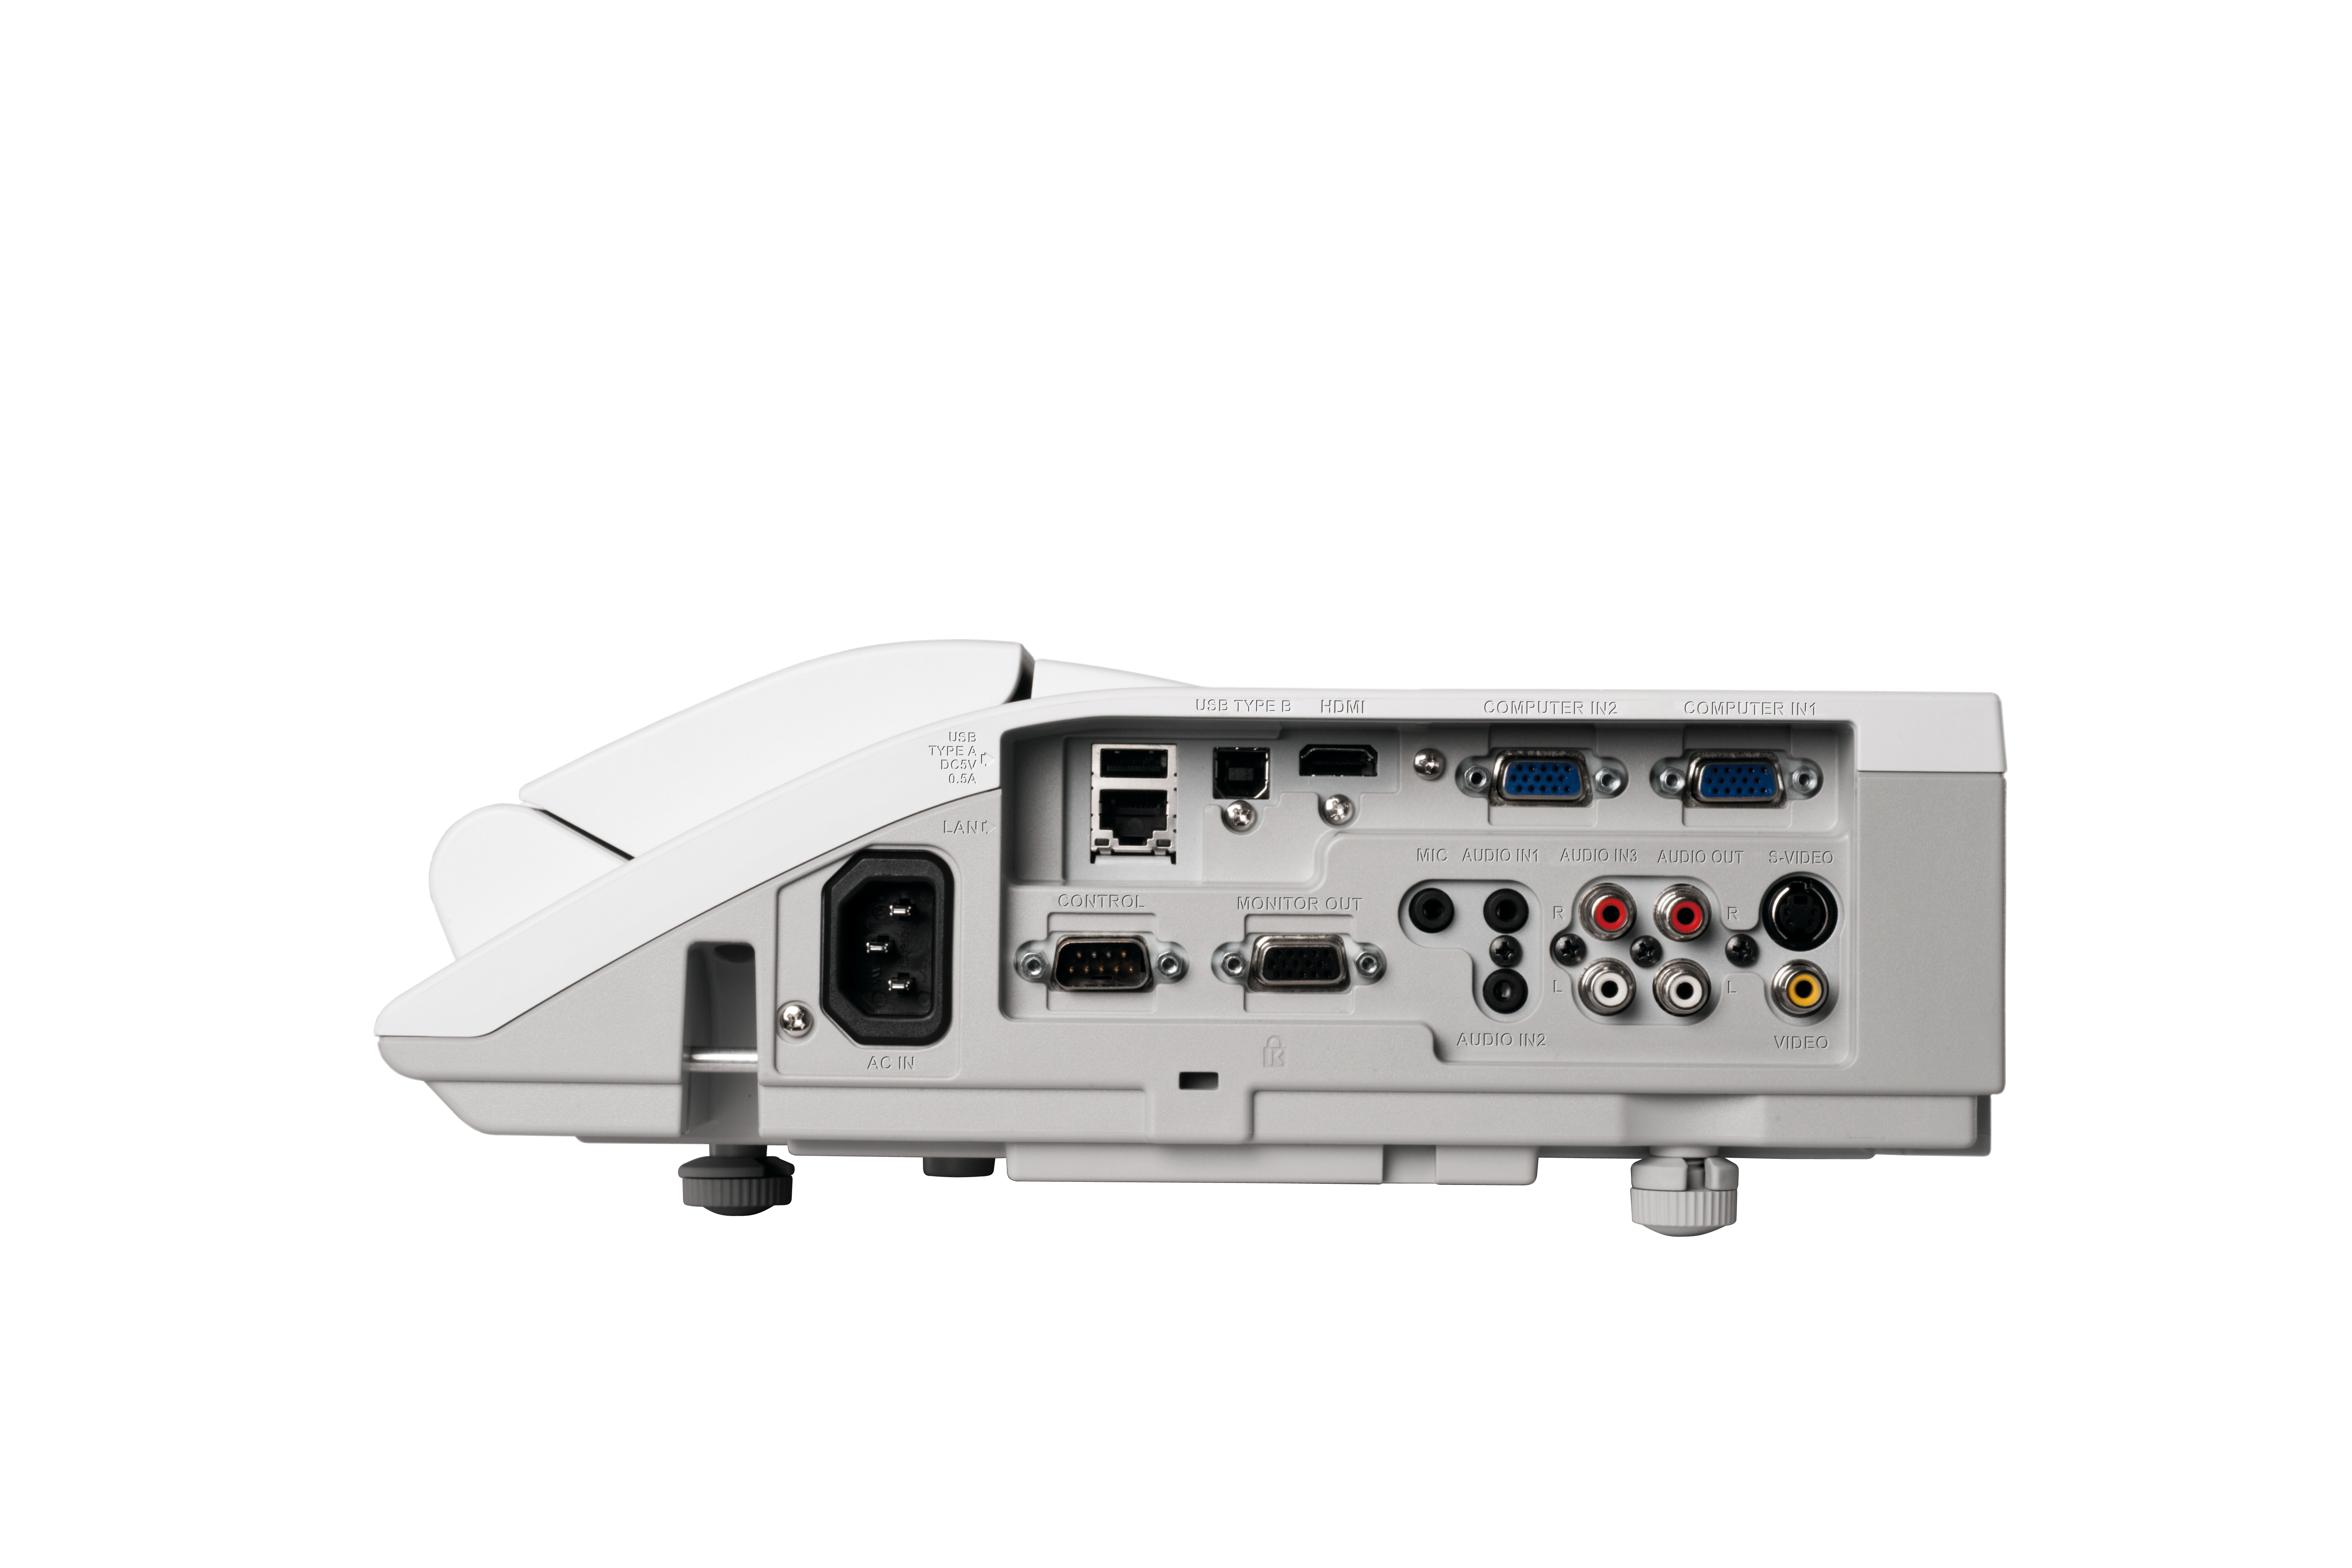 Hitachi Projektoren Cp Aw250nm Wxga Lcd Beamer X4041wn Wifi Projector Projektor